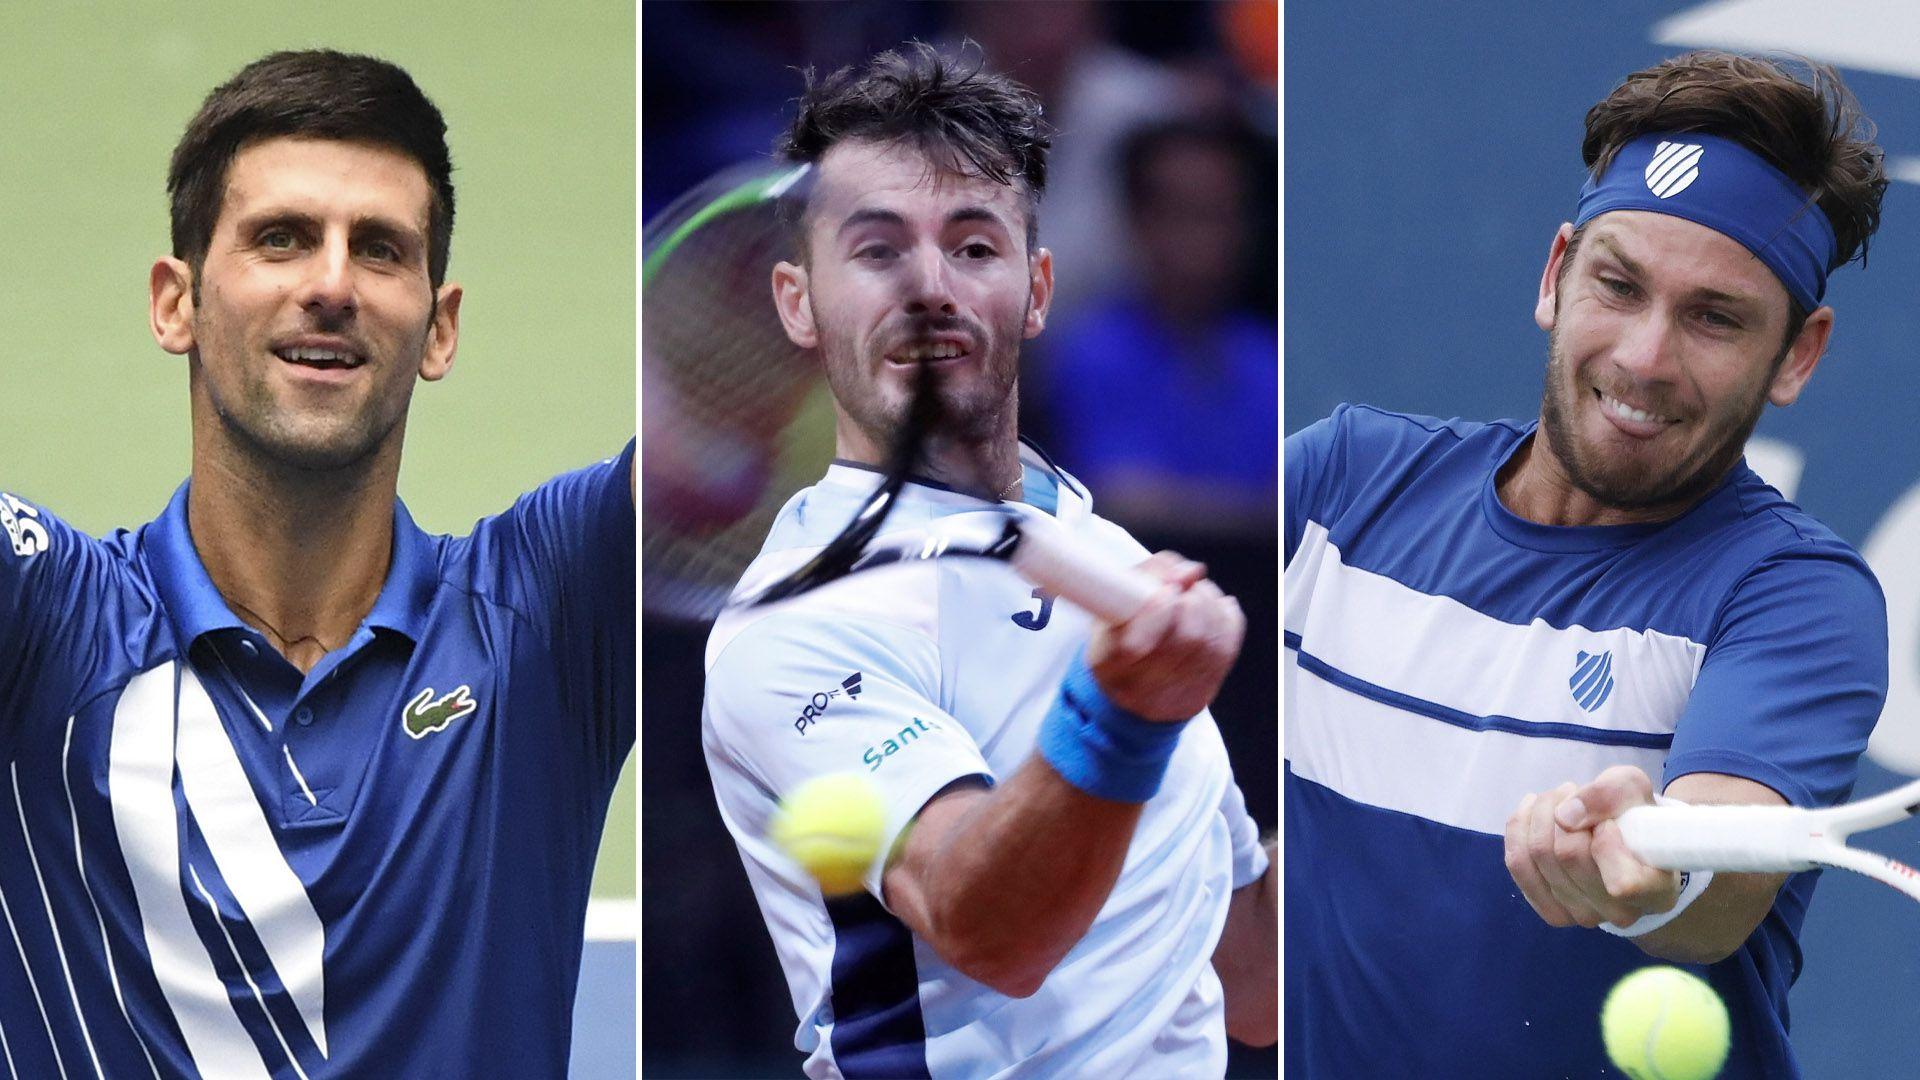 Djokovic, Lóndero y Coria